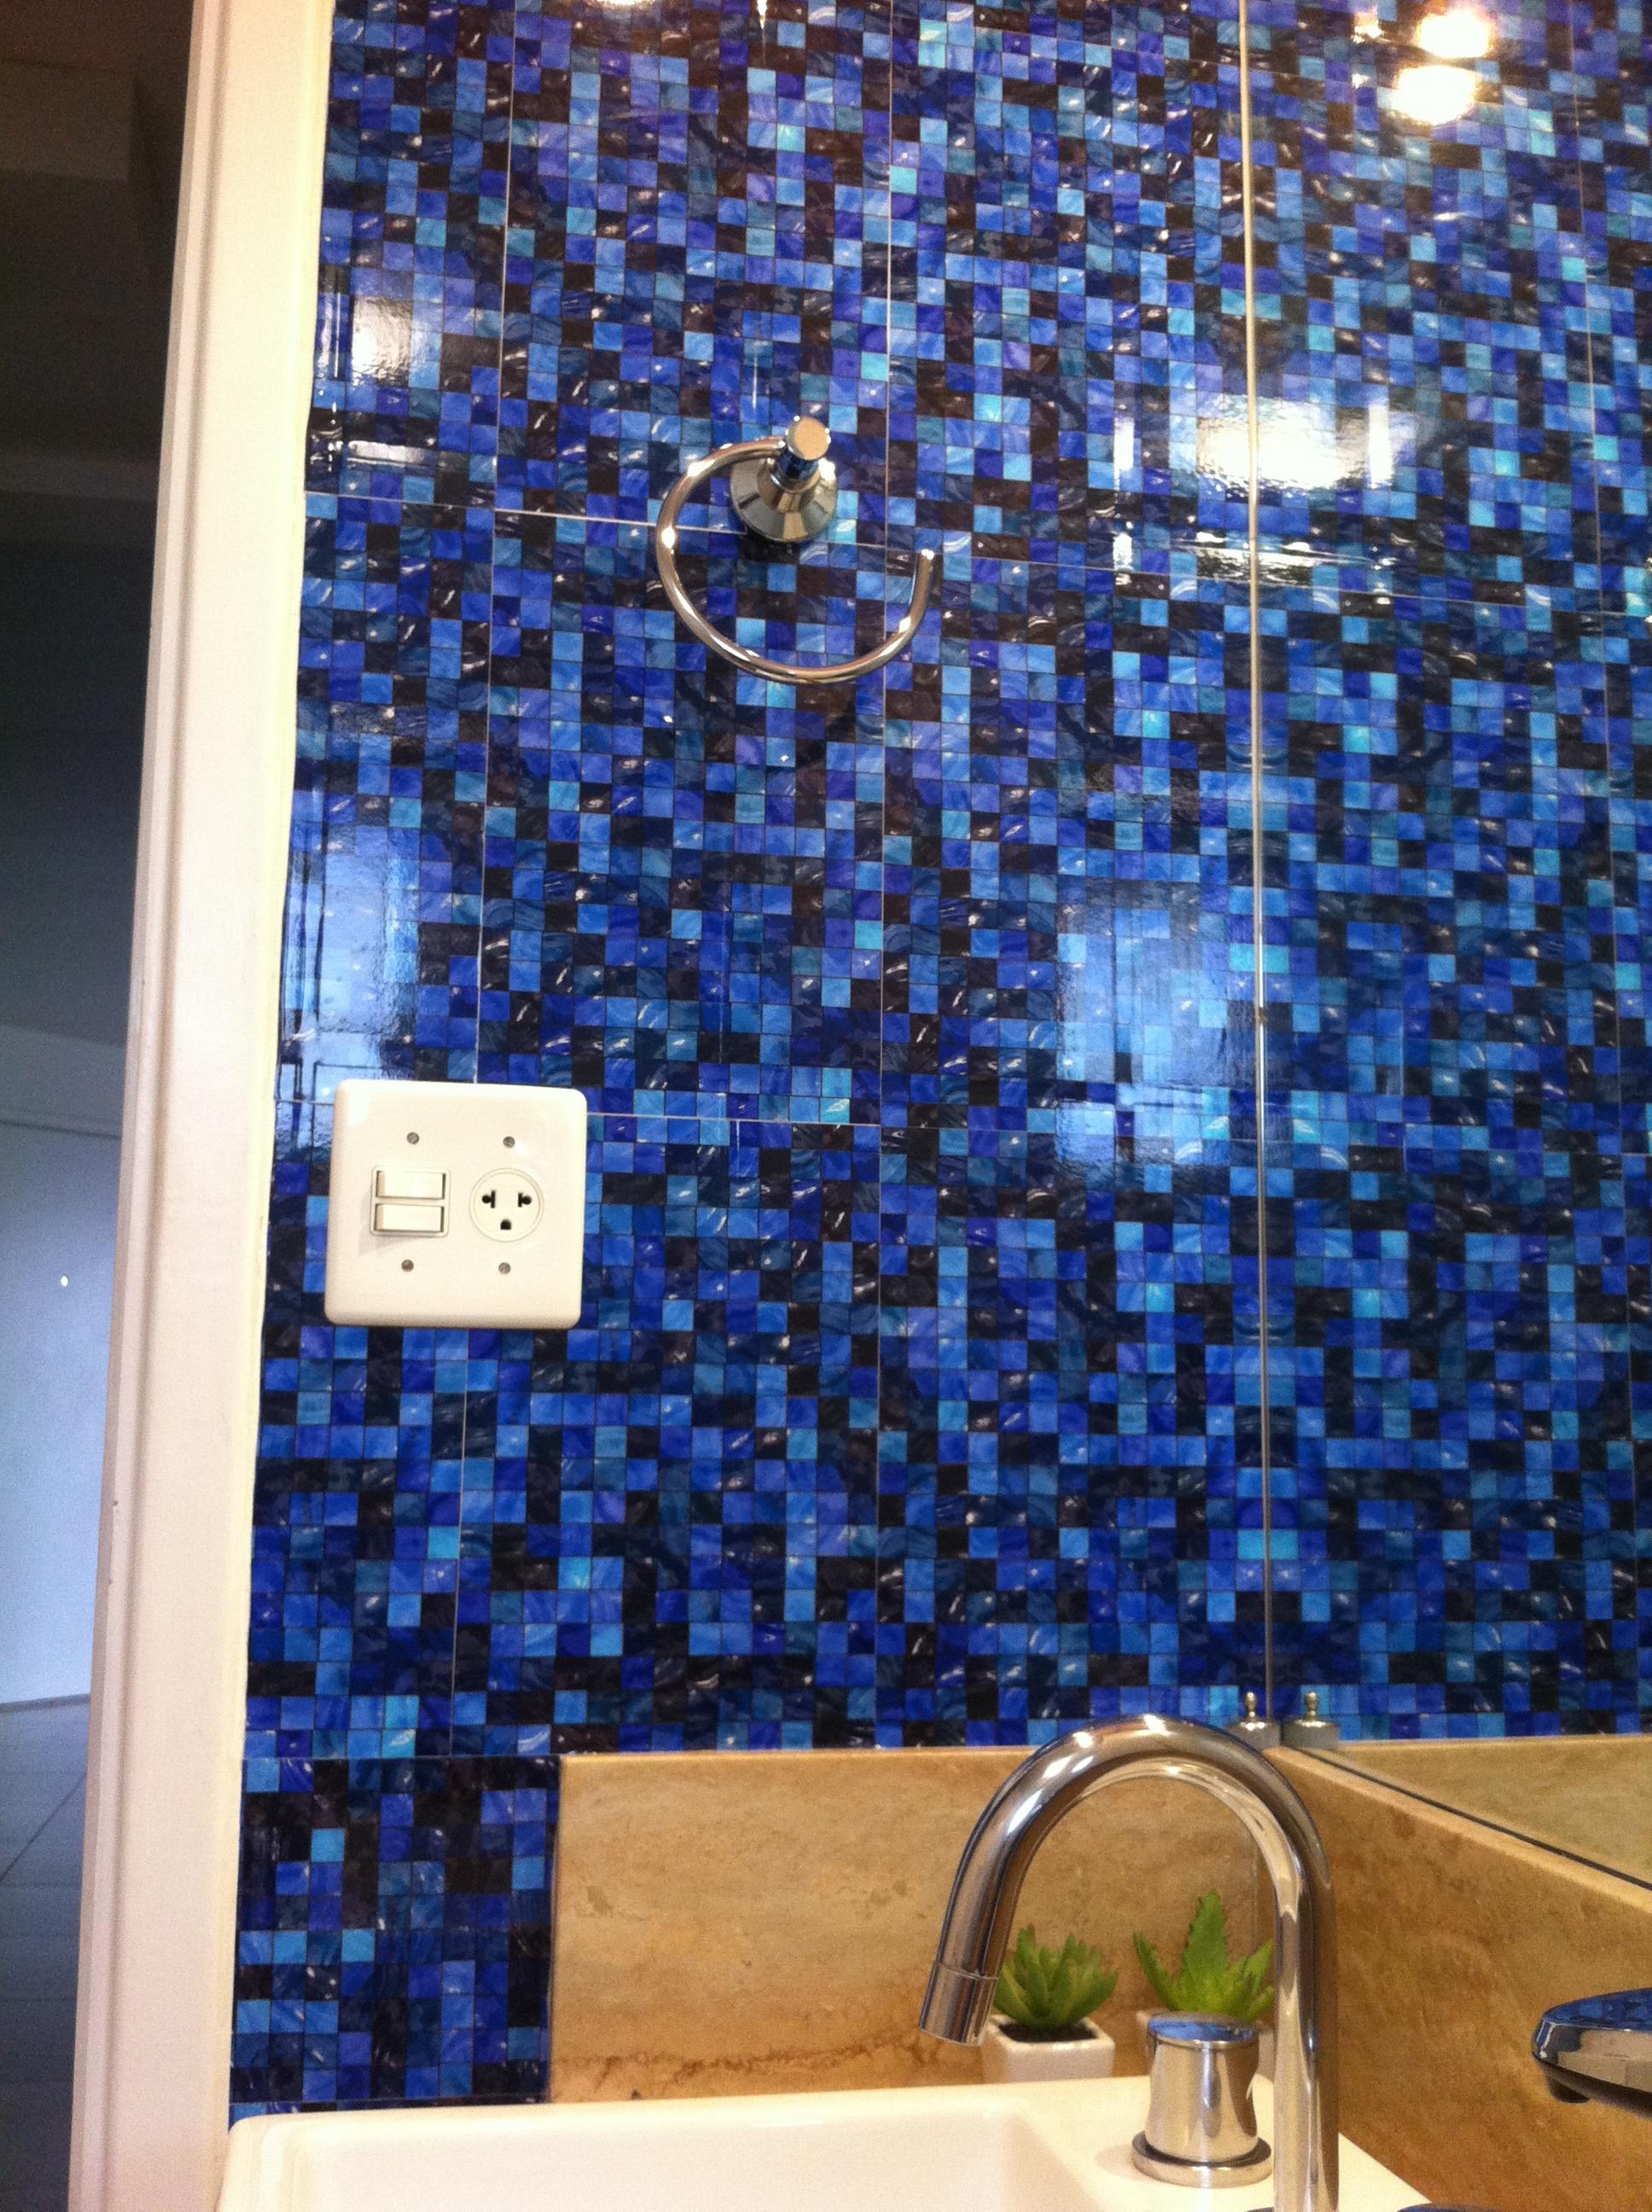 adesivo pastilha azul frete gratis parede kit adesivo pastilha azul  #2463A7 1936x2592 Banheiro Com Pastilhas De Vidro Azul